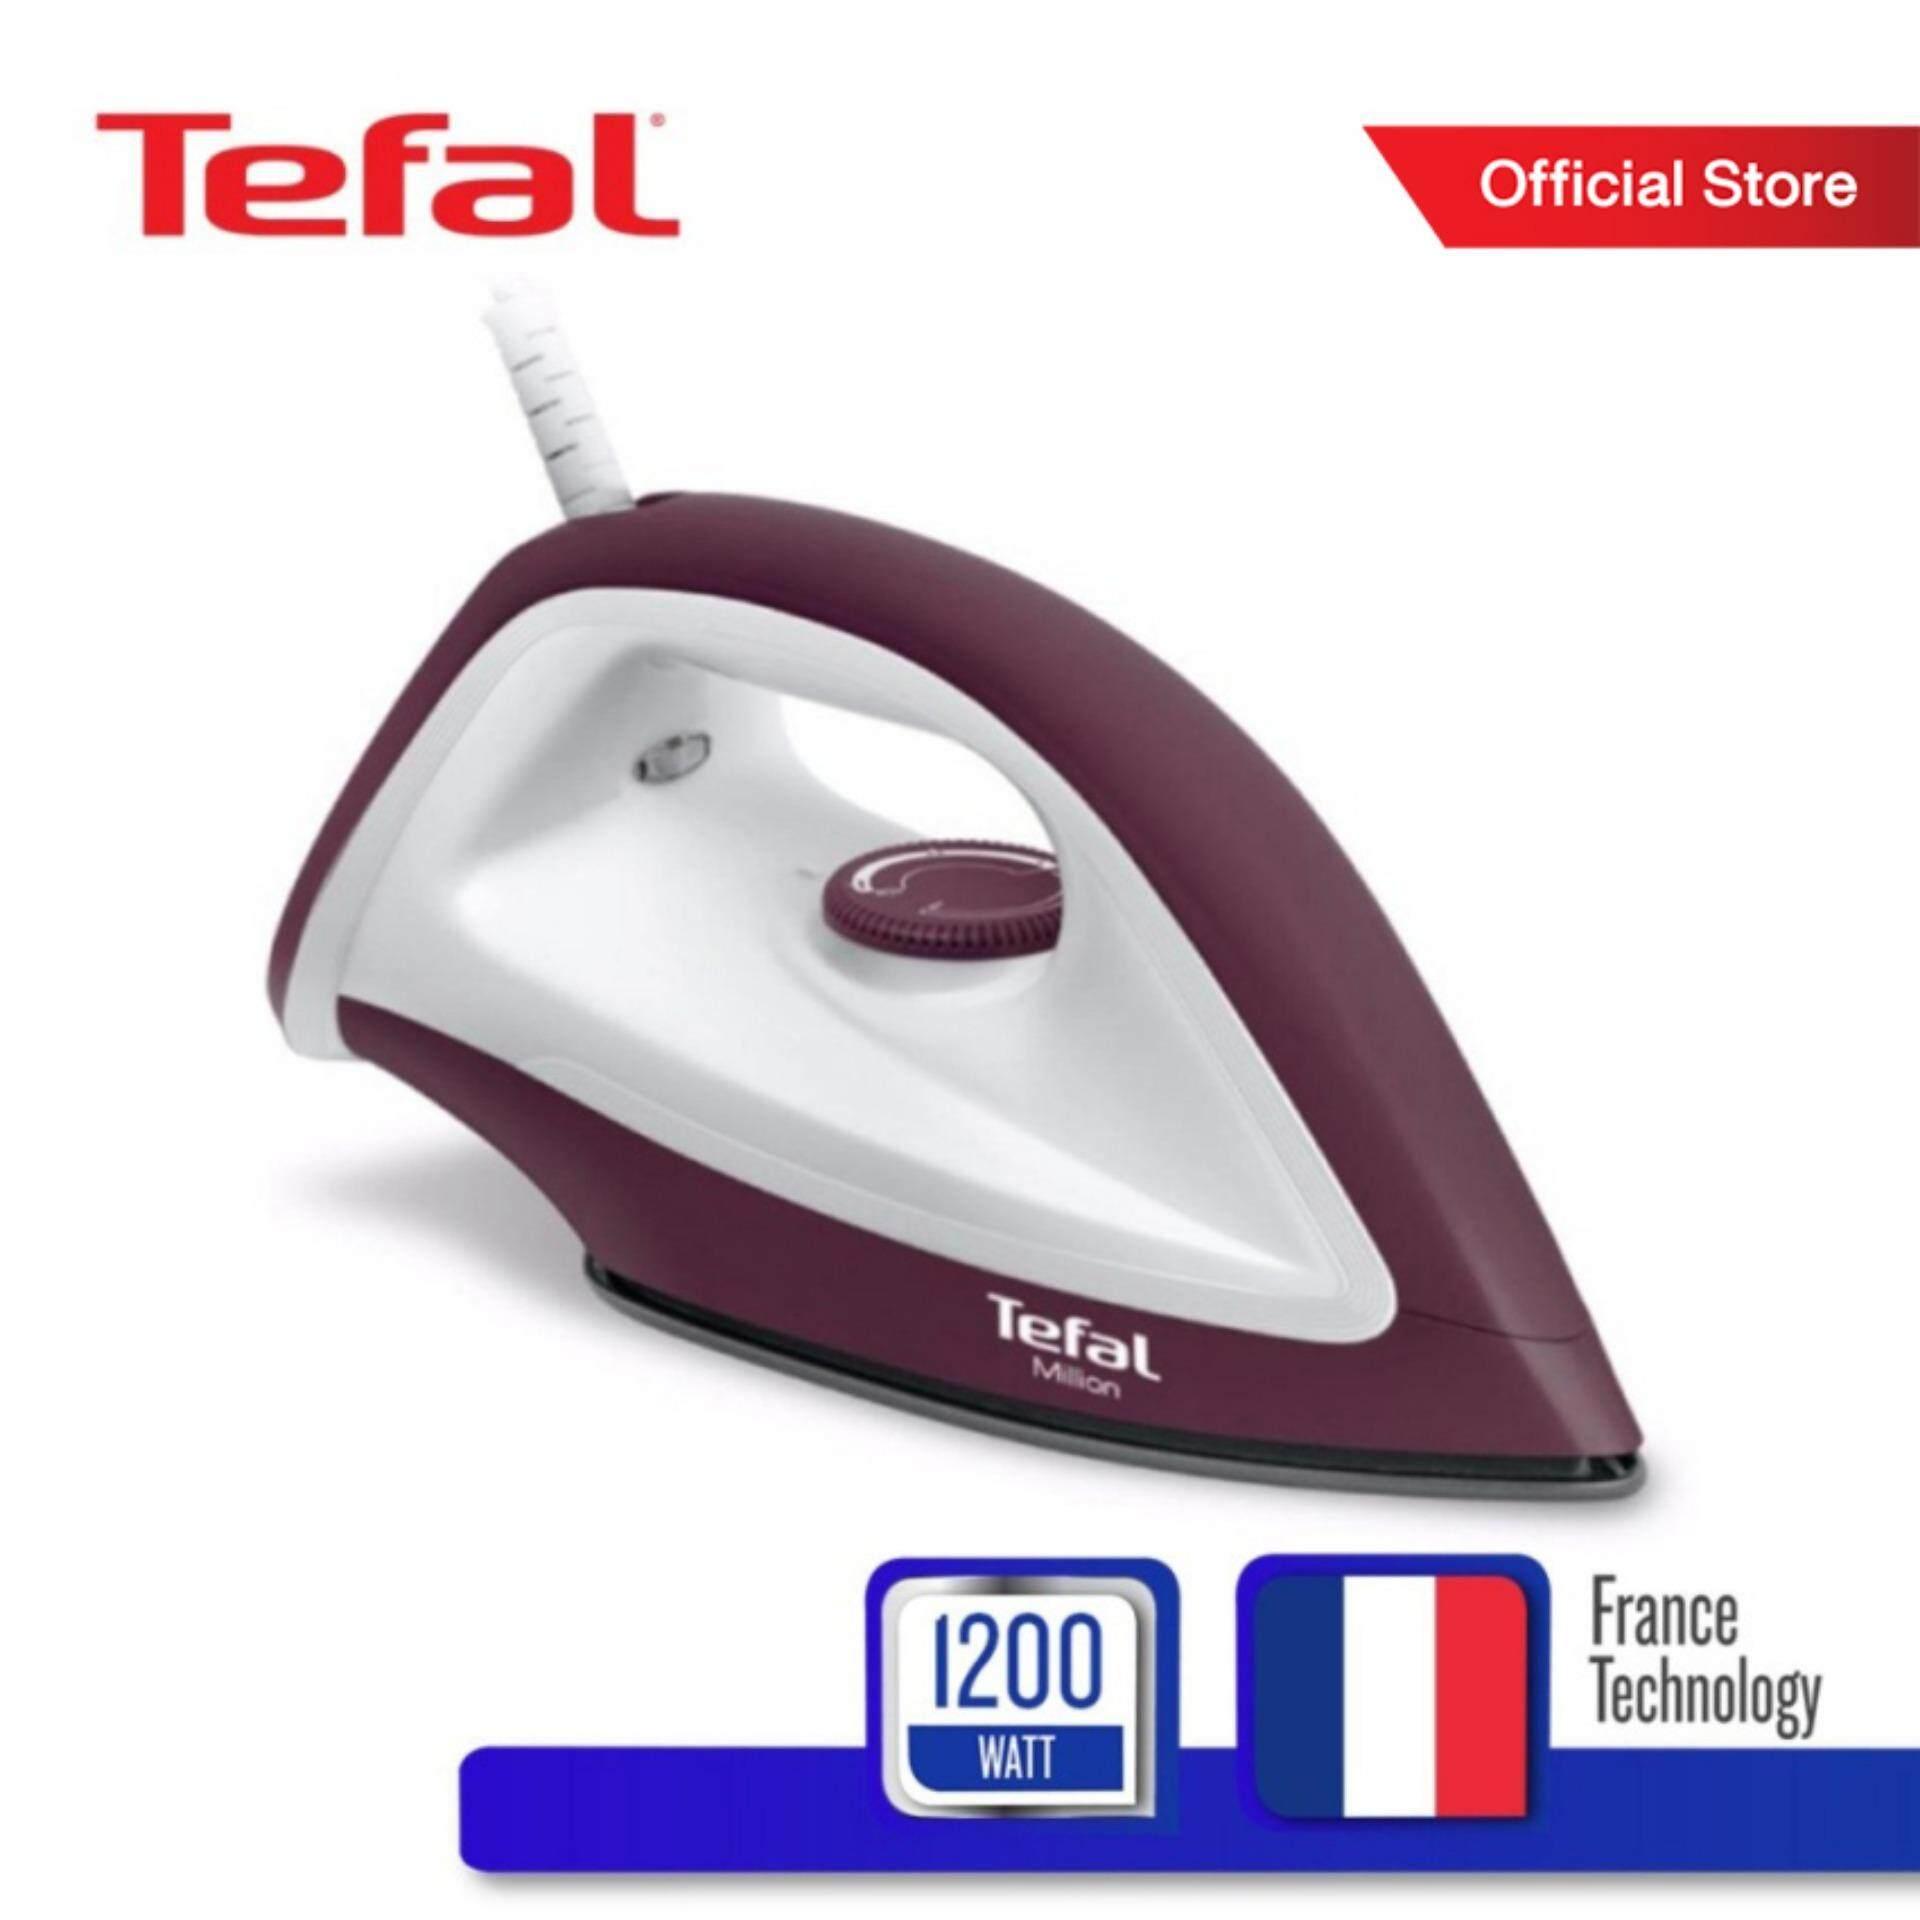 Tefal เตารีดแห้ง กำลังไฟ 1200 วัตต์ รุ่น FS2622T0 -Chocolate